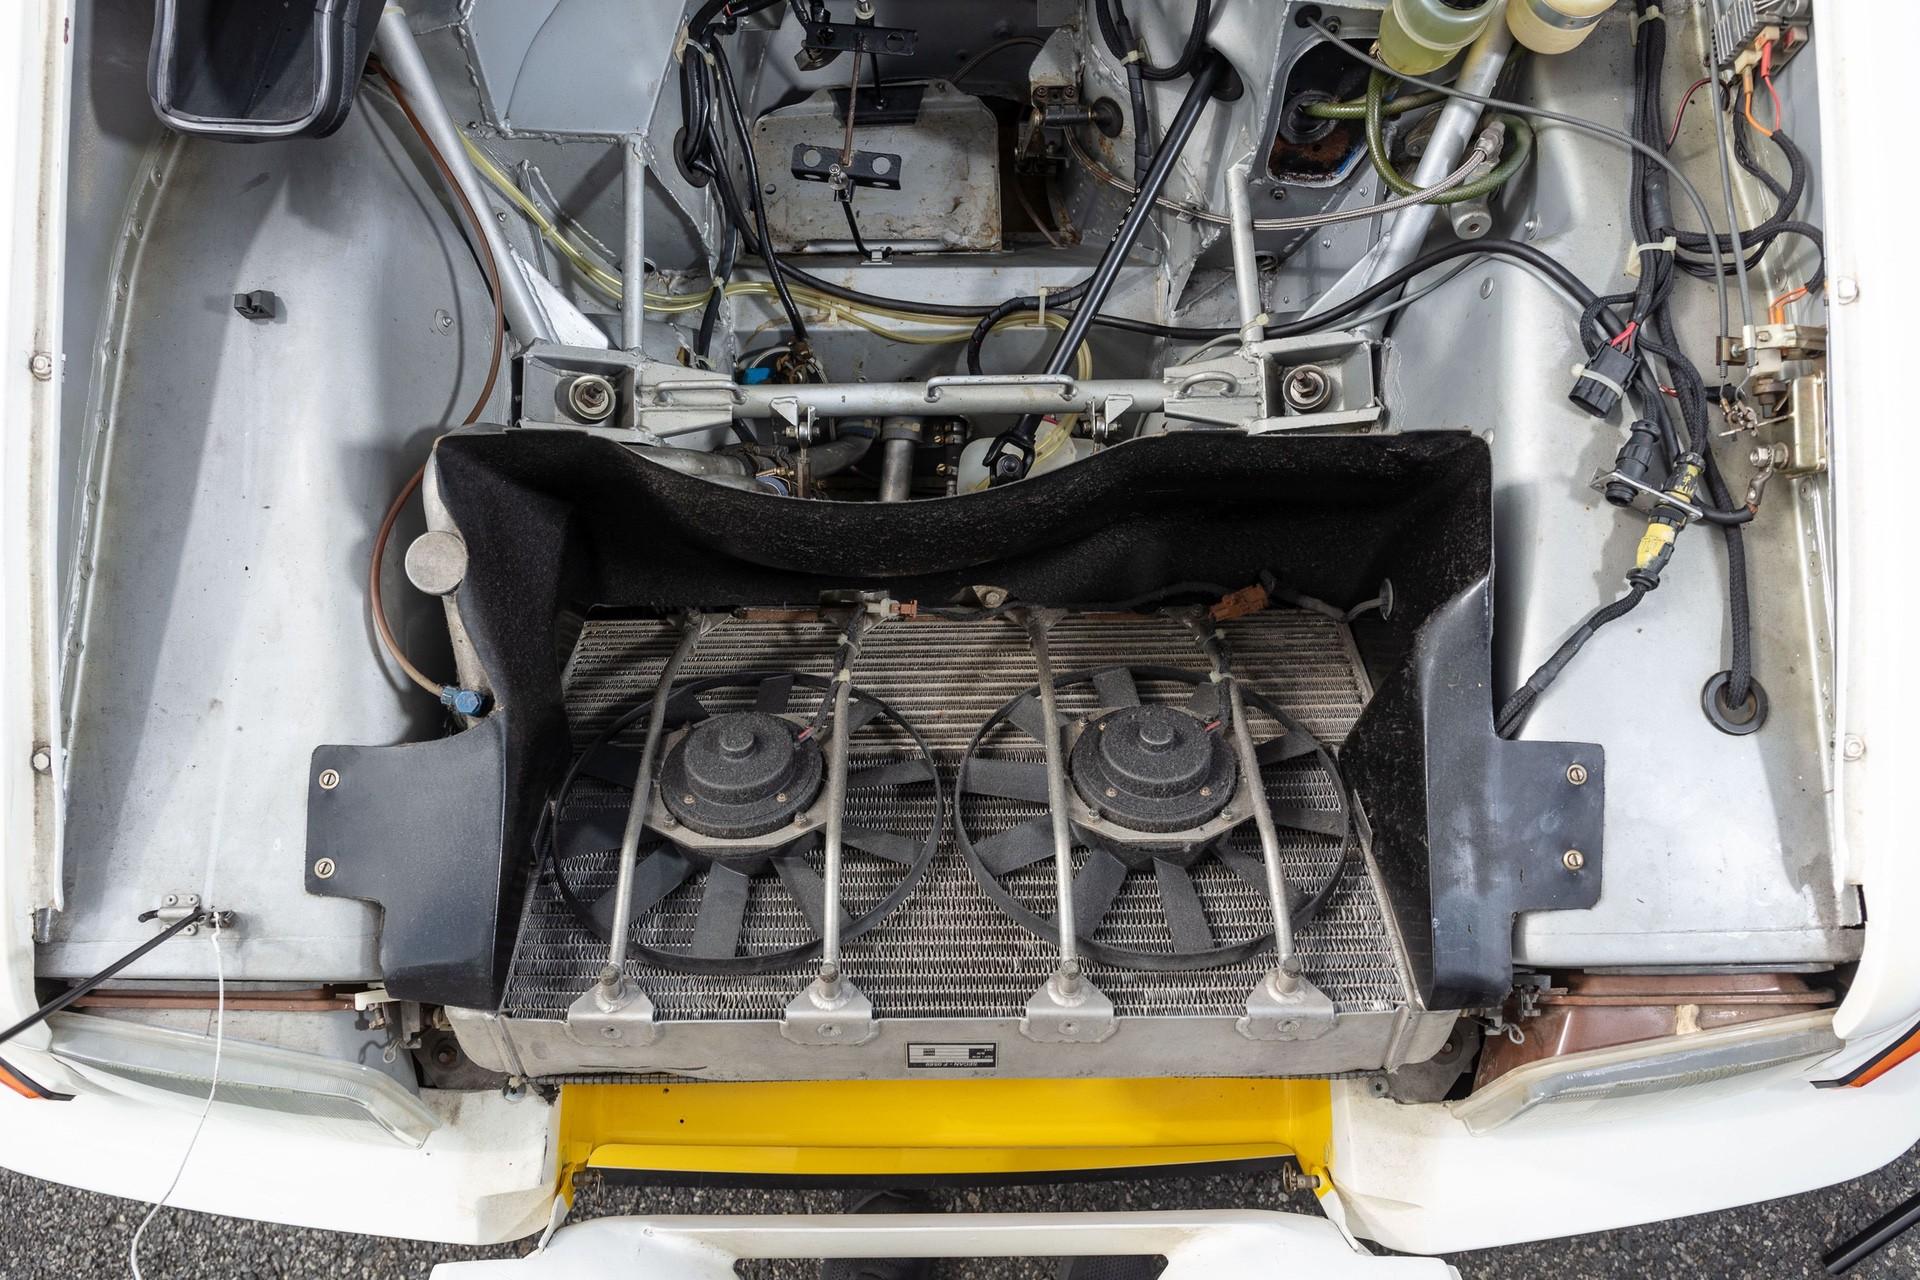 Renault_R5_Maxi_Turbo_ex-Carlos_Sainz-0039